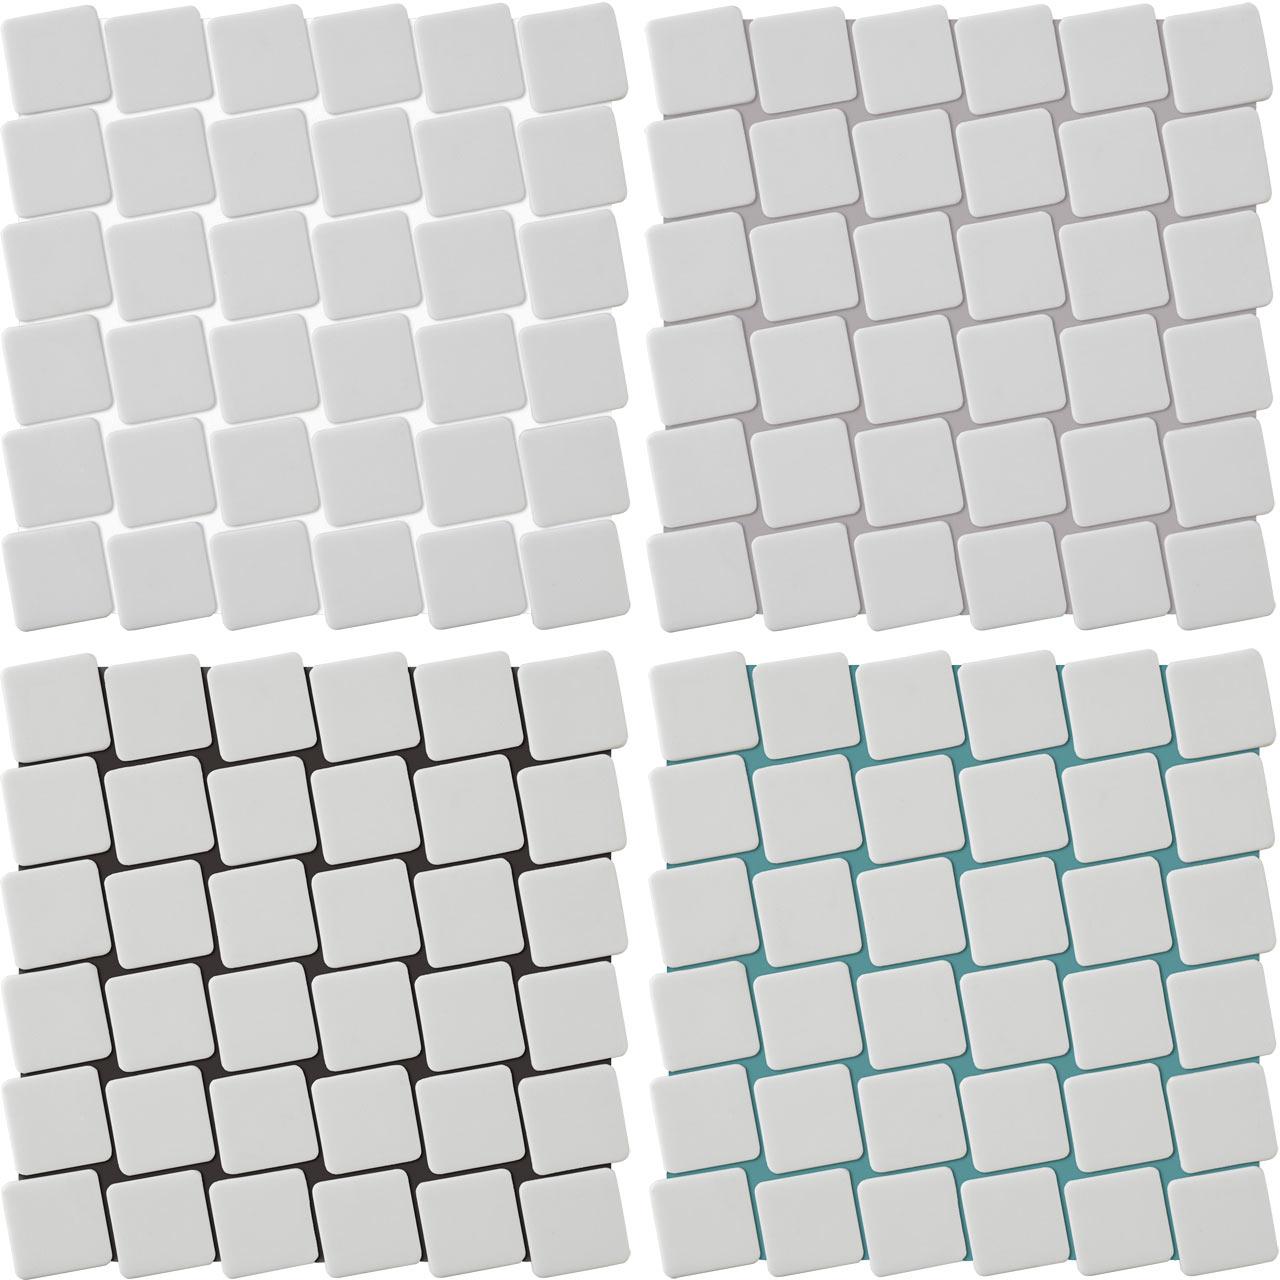 7 Beautiful Black White Tiles For The Bathroom